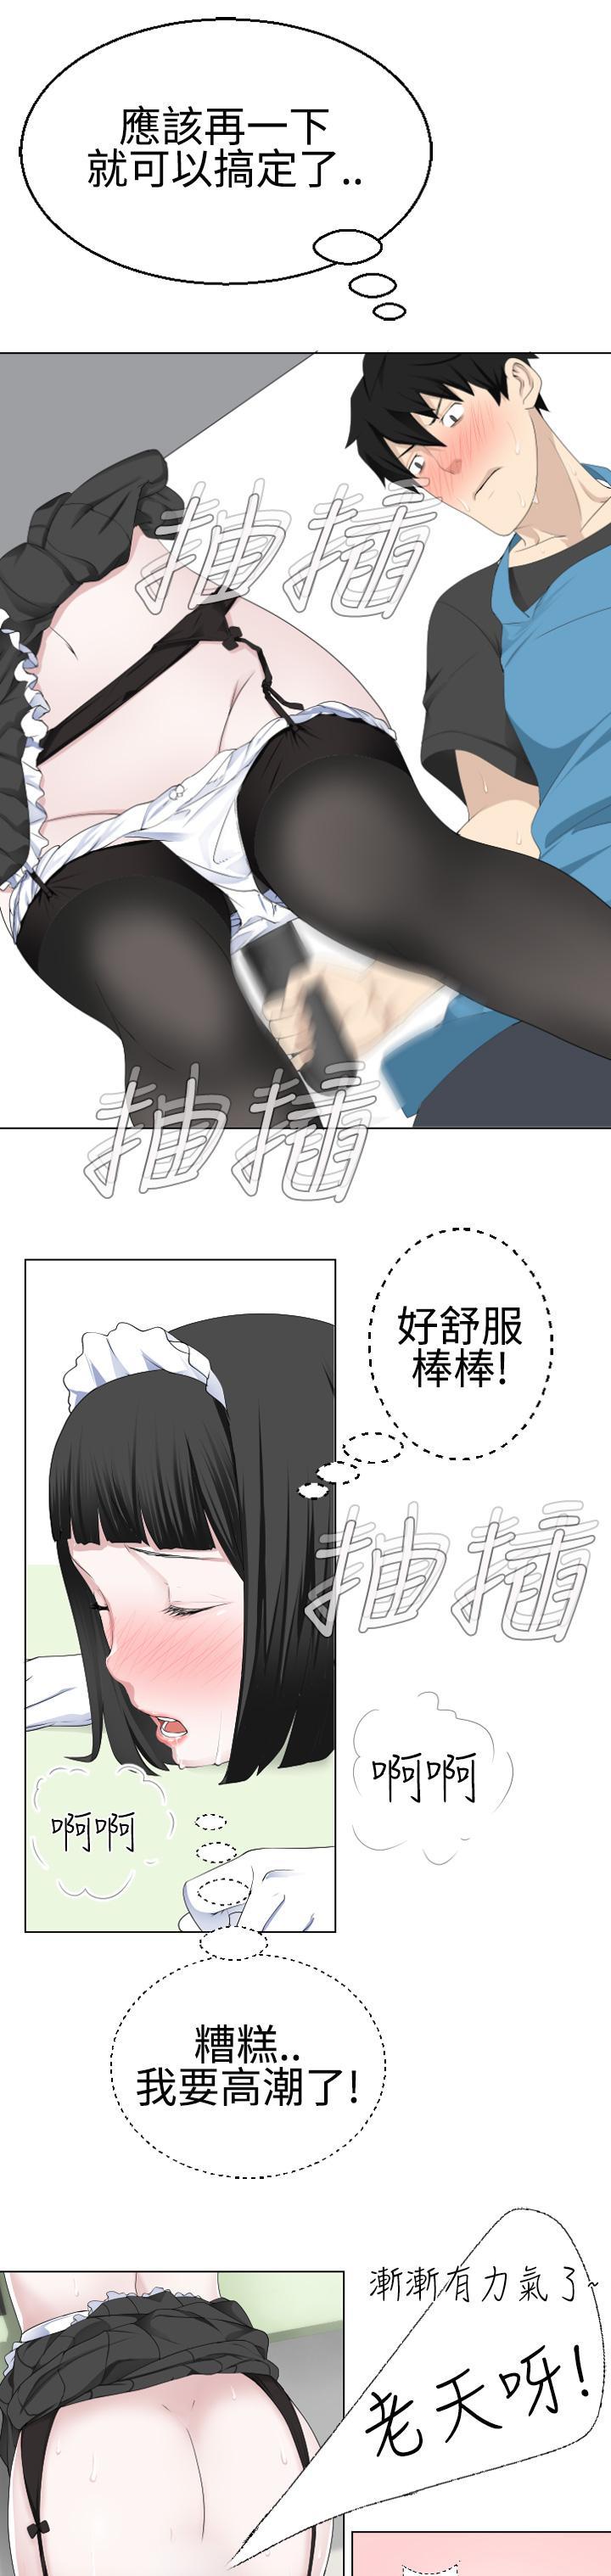 [SOSO] Franken Jo 为爱而生 法兰克赵 Ch.1~19 [Chinese]中文 236